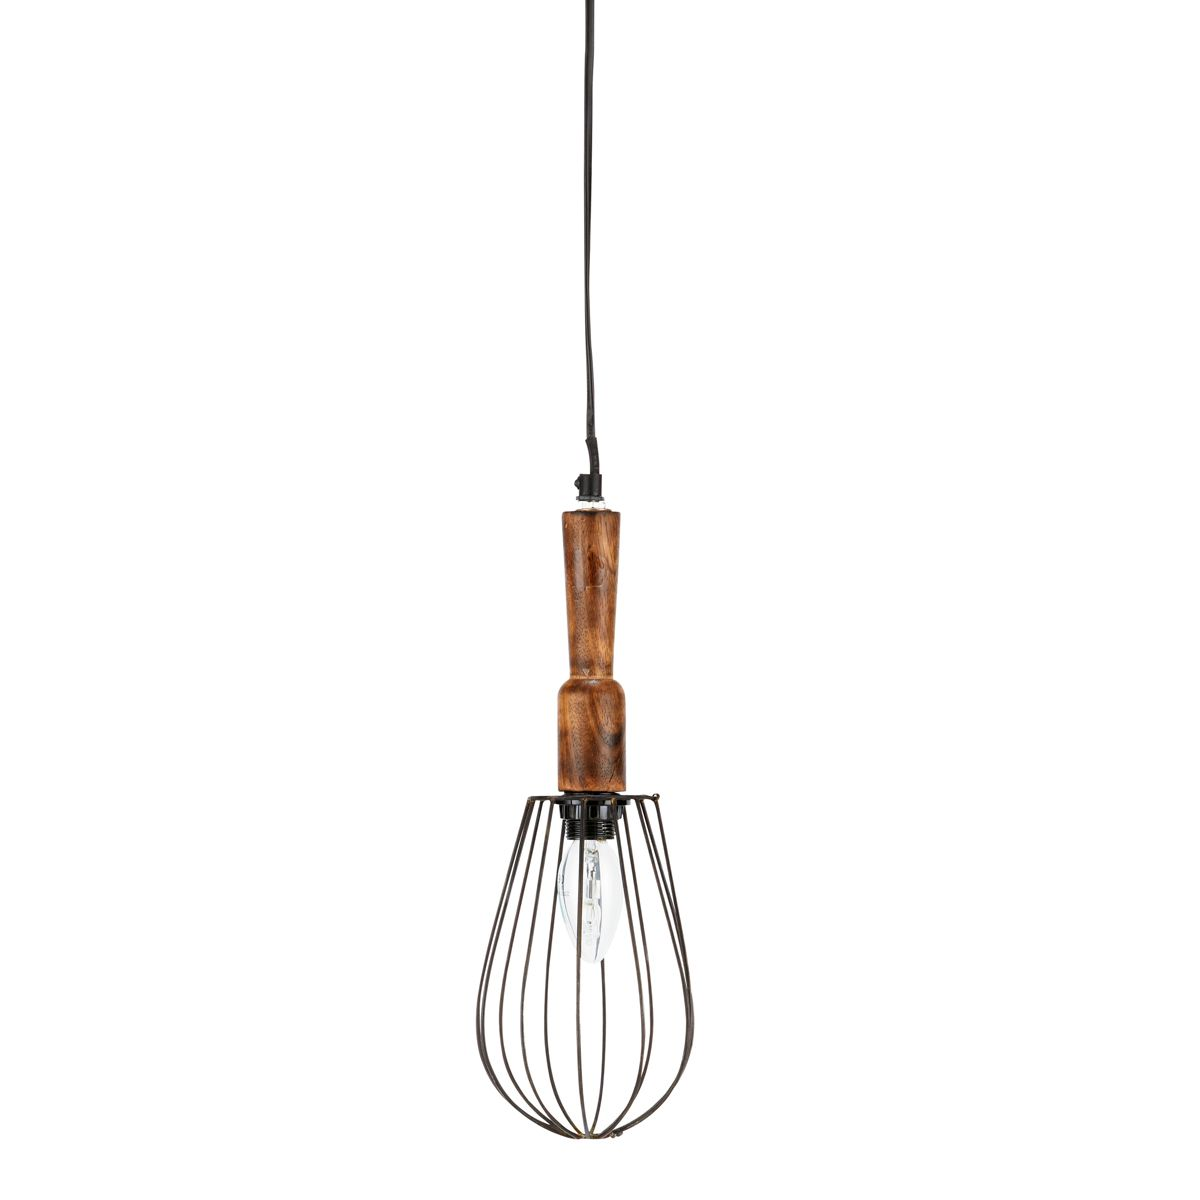 Lámpara de techo tipo lámpara portátil de madera y metal Diám. 13 cm LÉONTINE